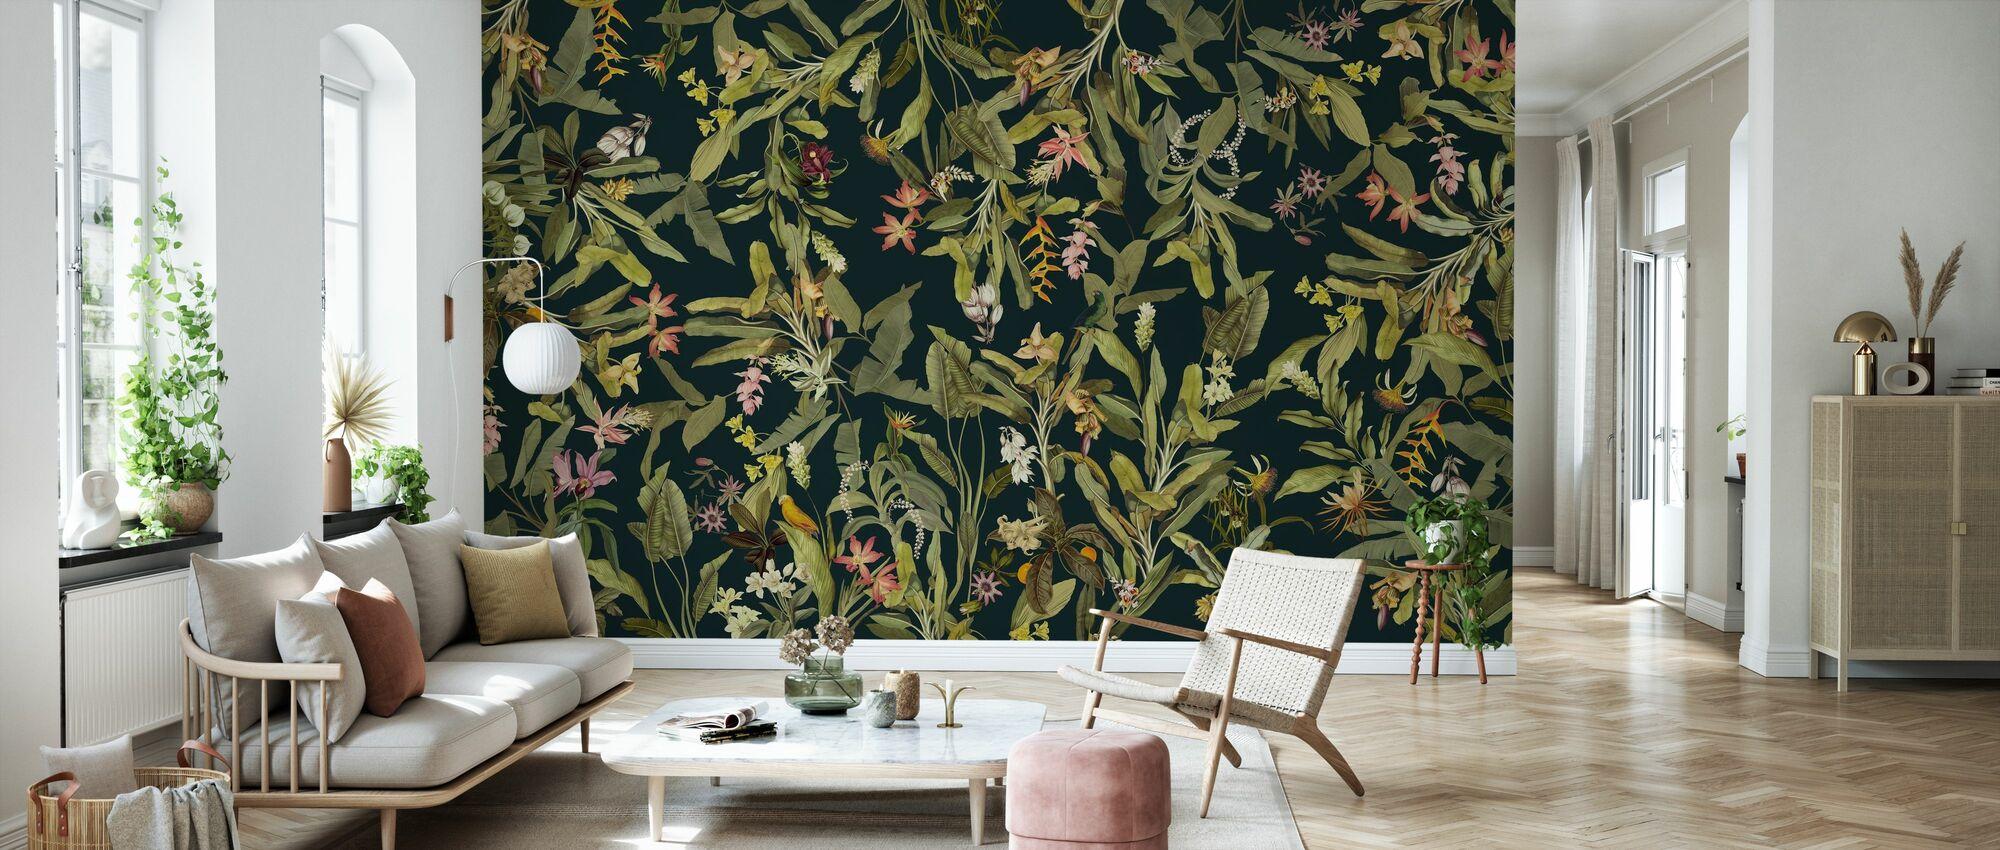 Botanical Tropics - Dark - Wallpaper - Living Room